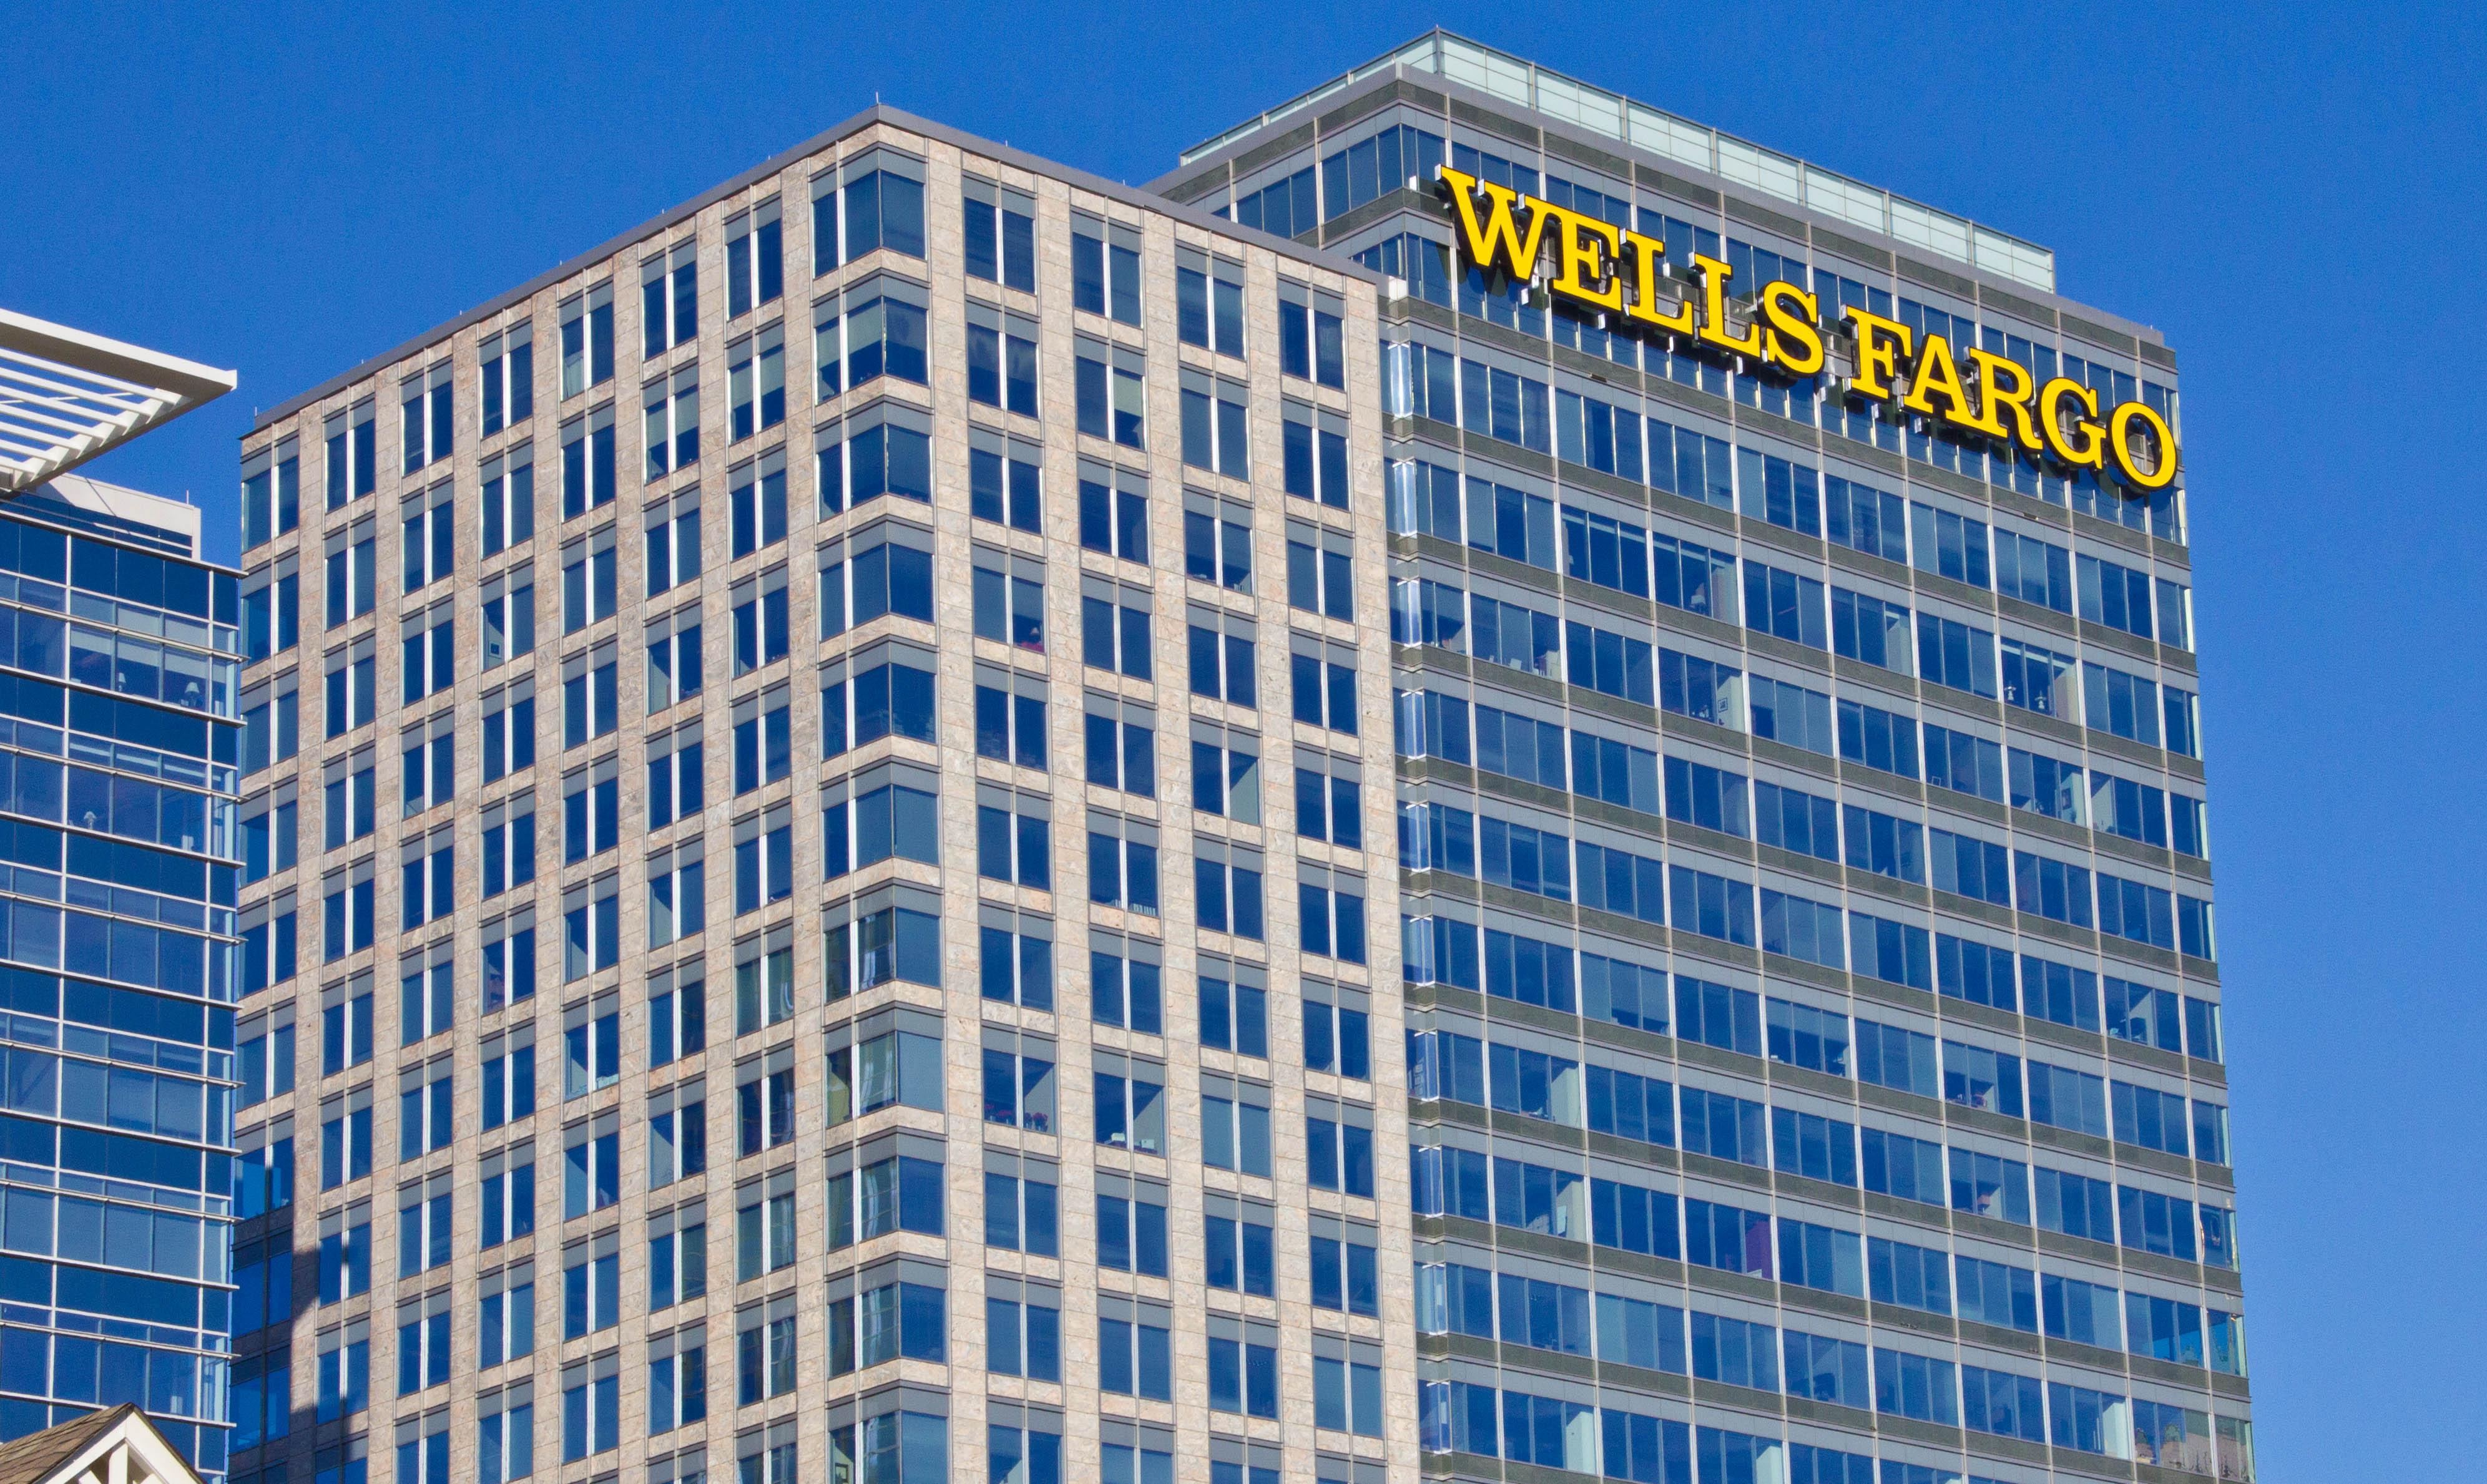 Wells Fargo Office Building Emergency